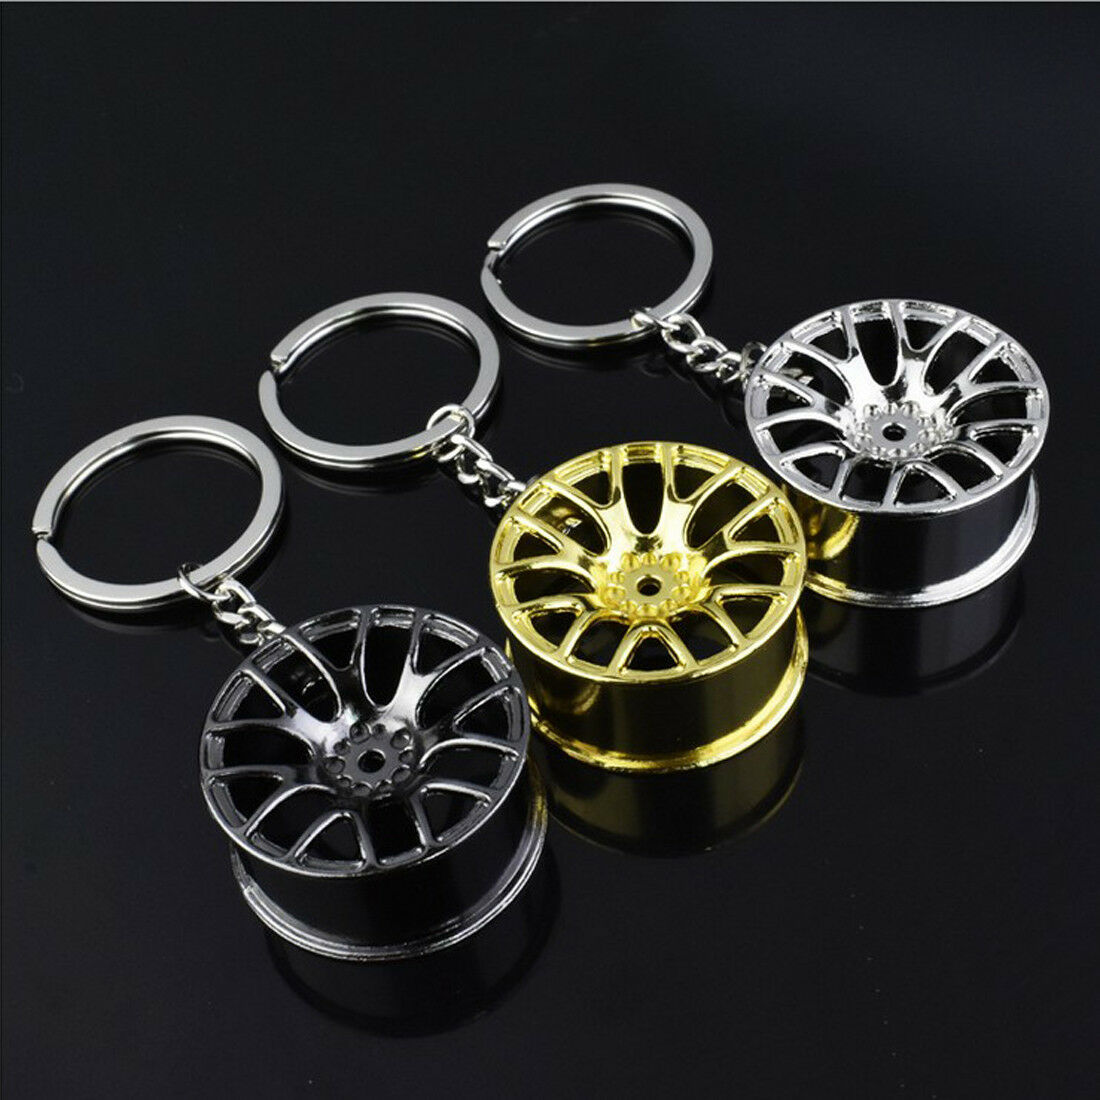 Creative Car Auto Part Model Keychain Key Chain Ring Keyring Keyfob Holder New